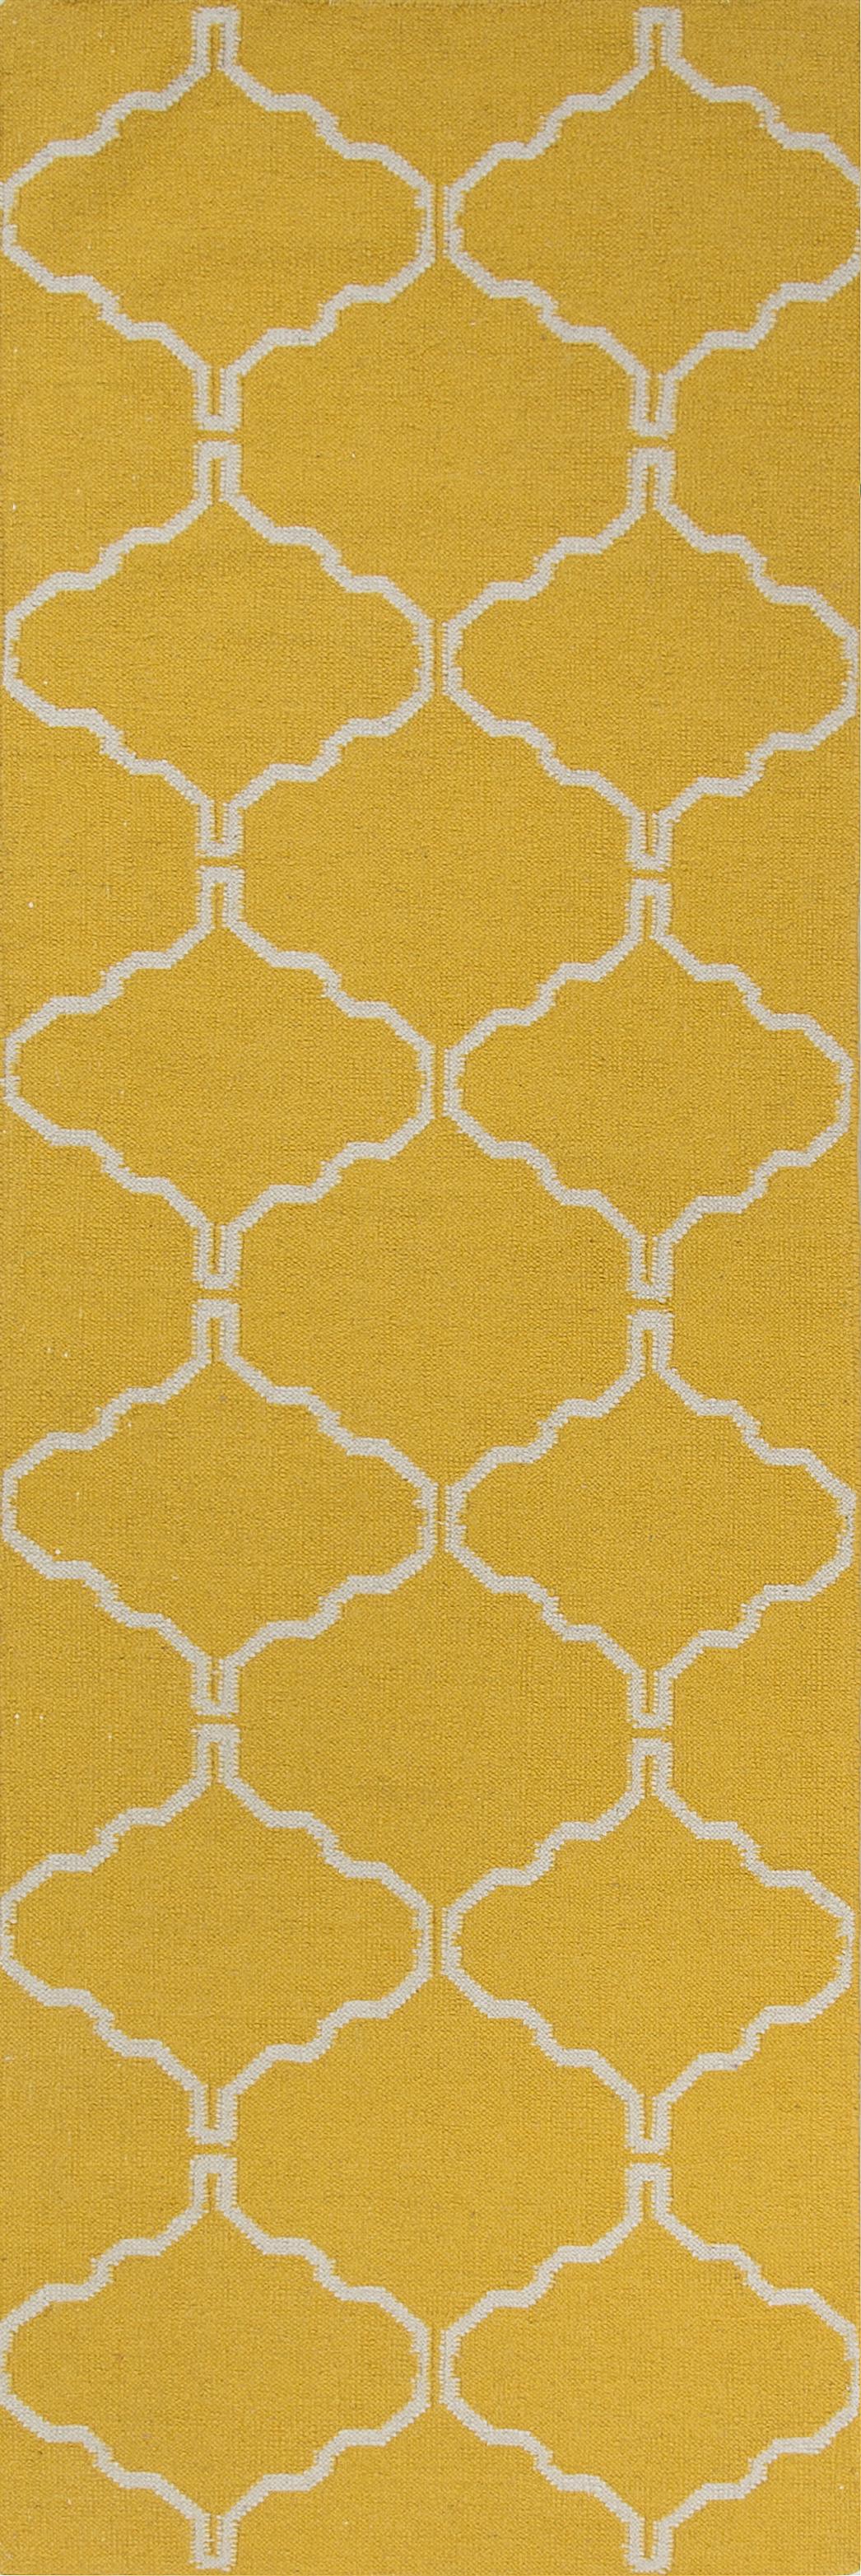 JAIPUR Rugs Maroc 2.6 x 8 Rug - Item Number: RUG104194